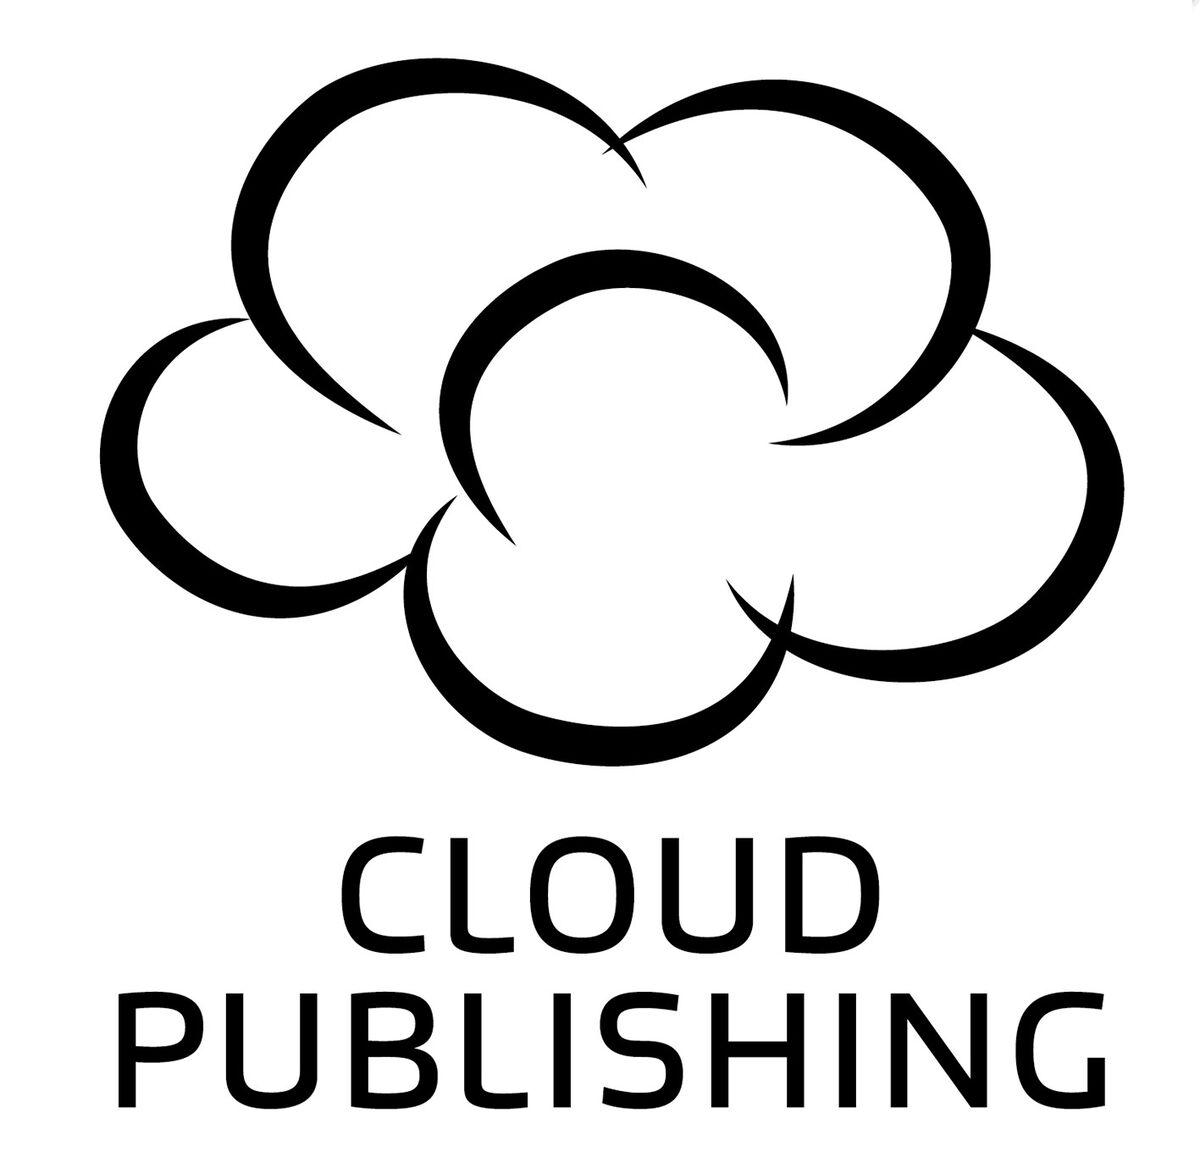 cloudpublishing